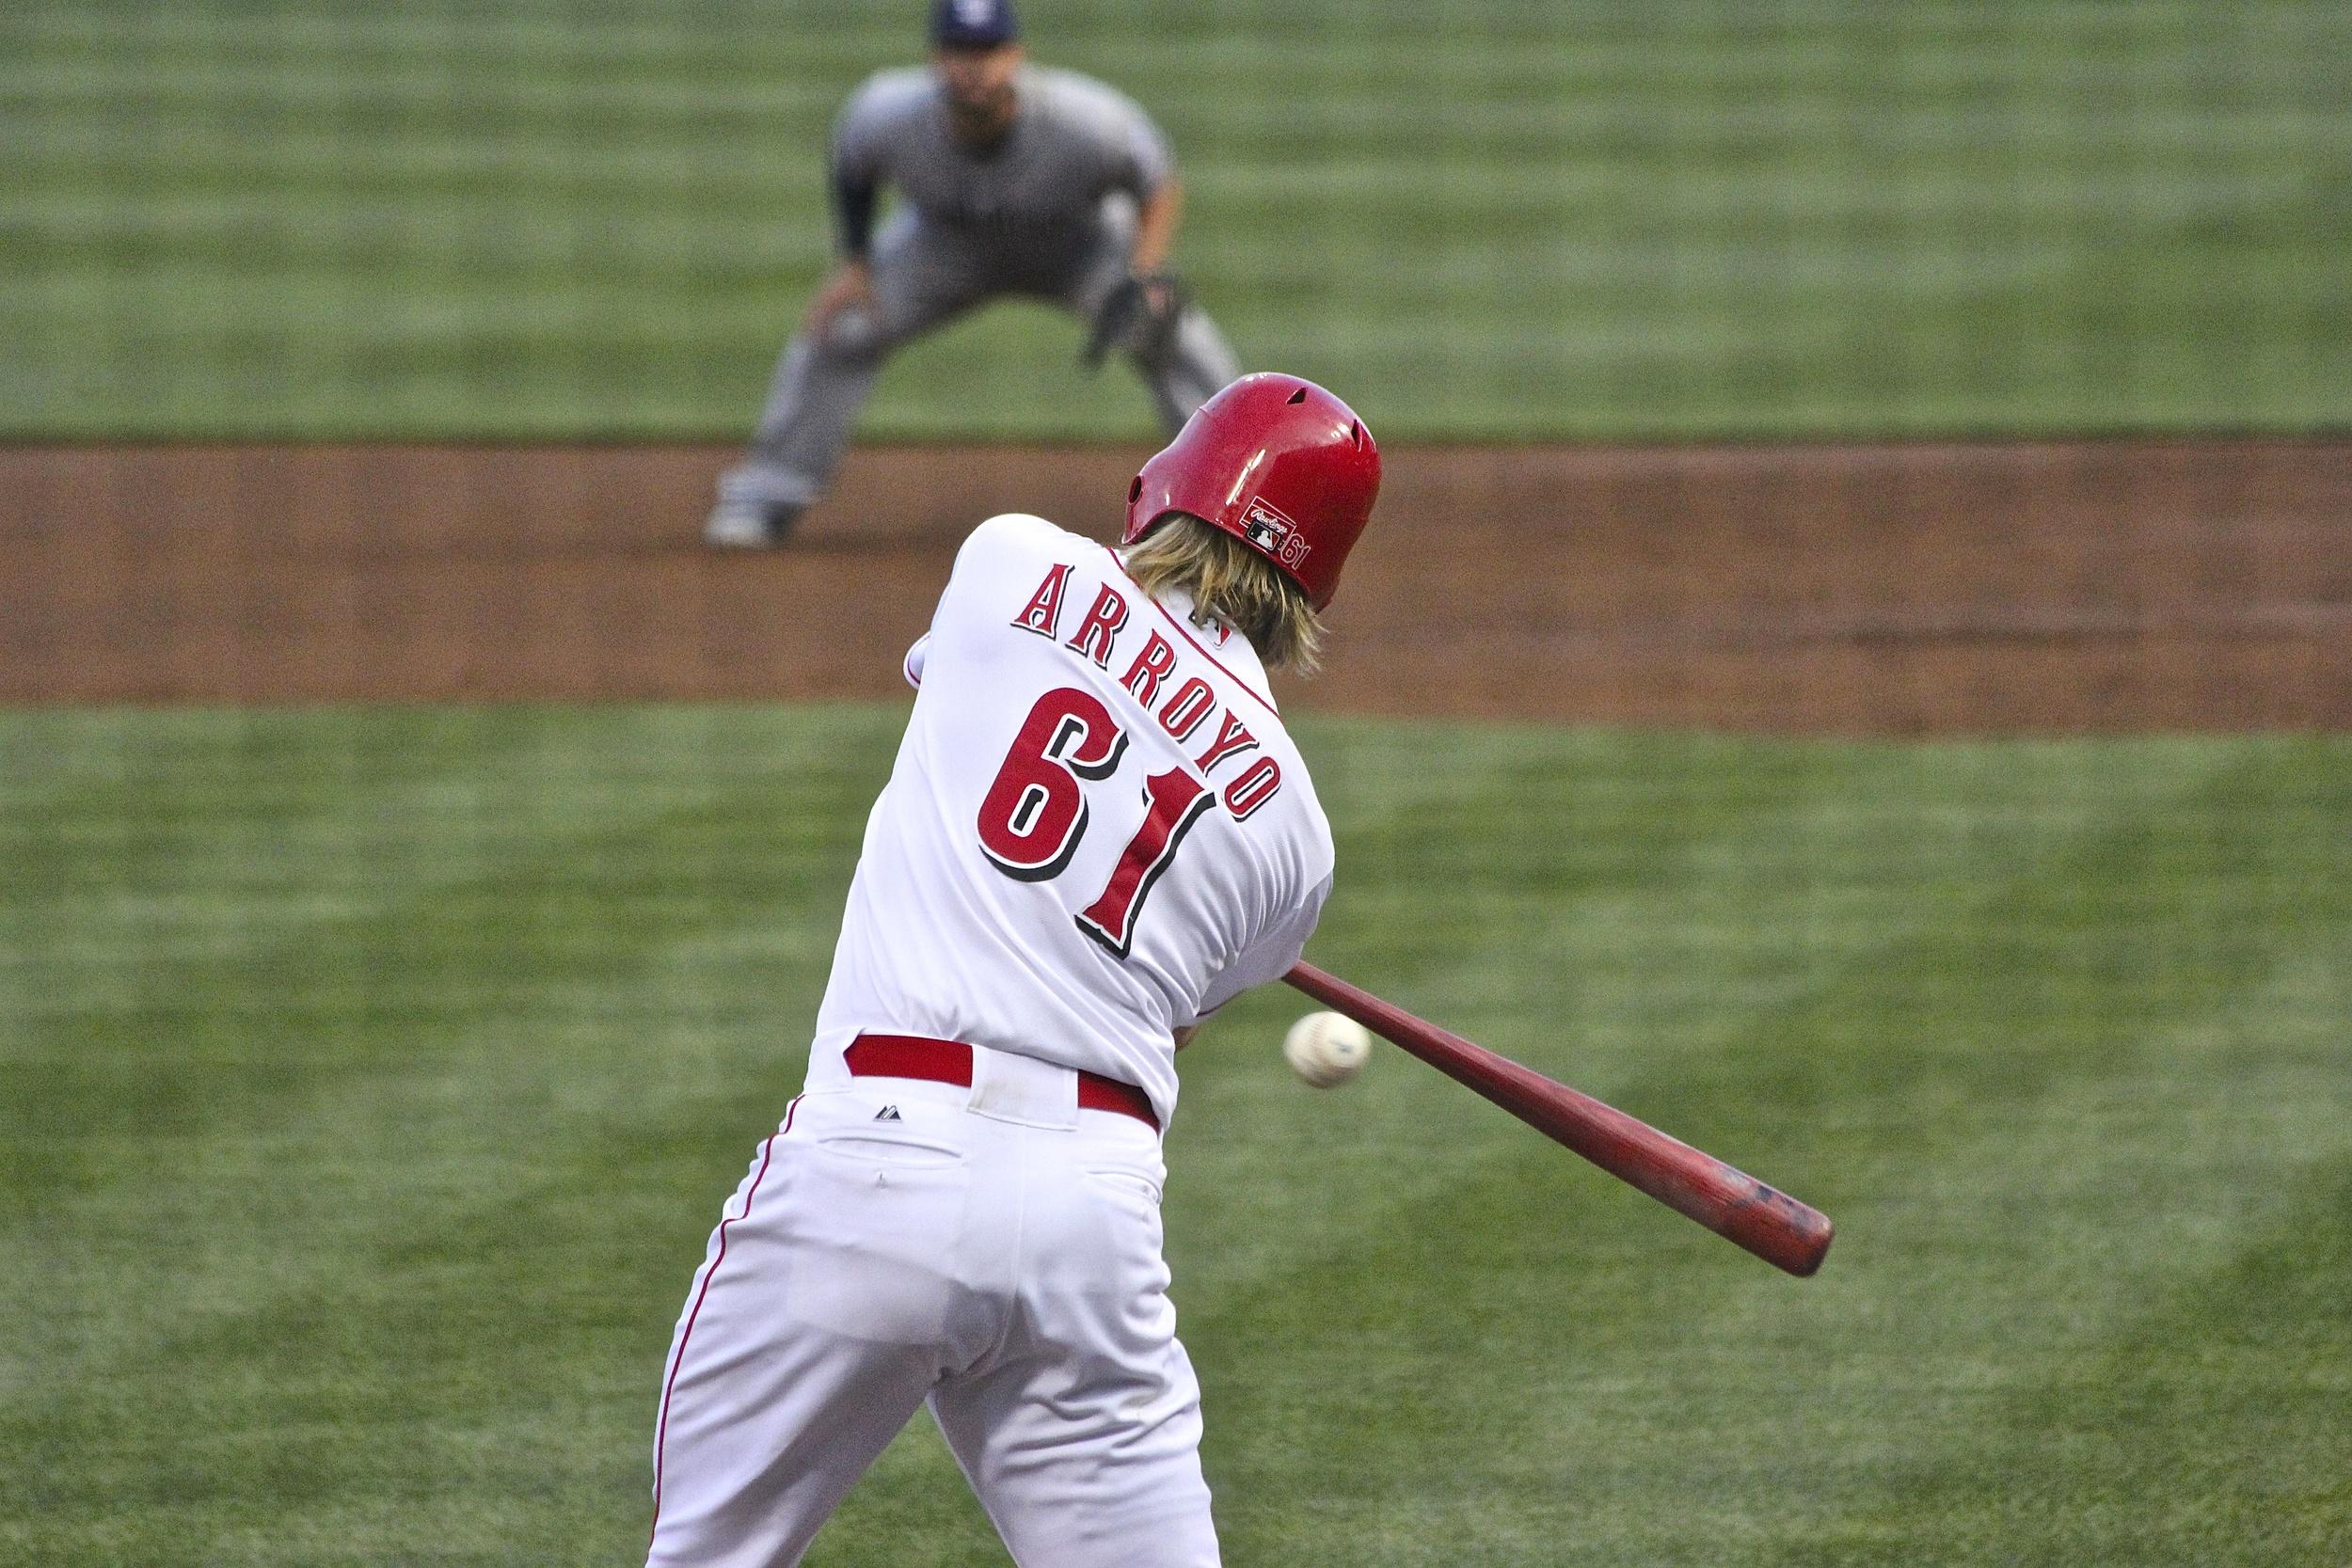 Bronson Arroyo with the bat